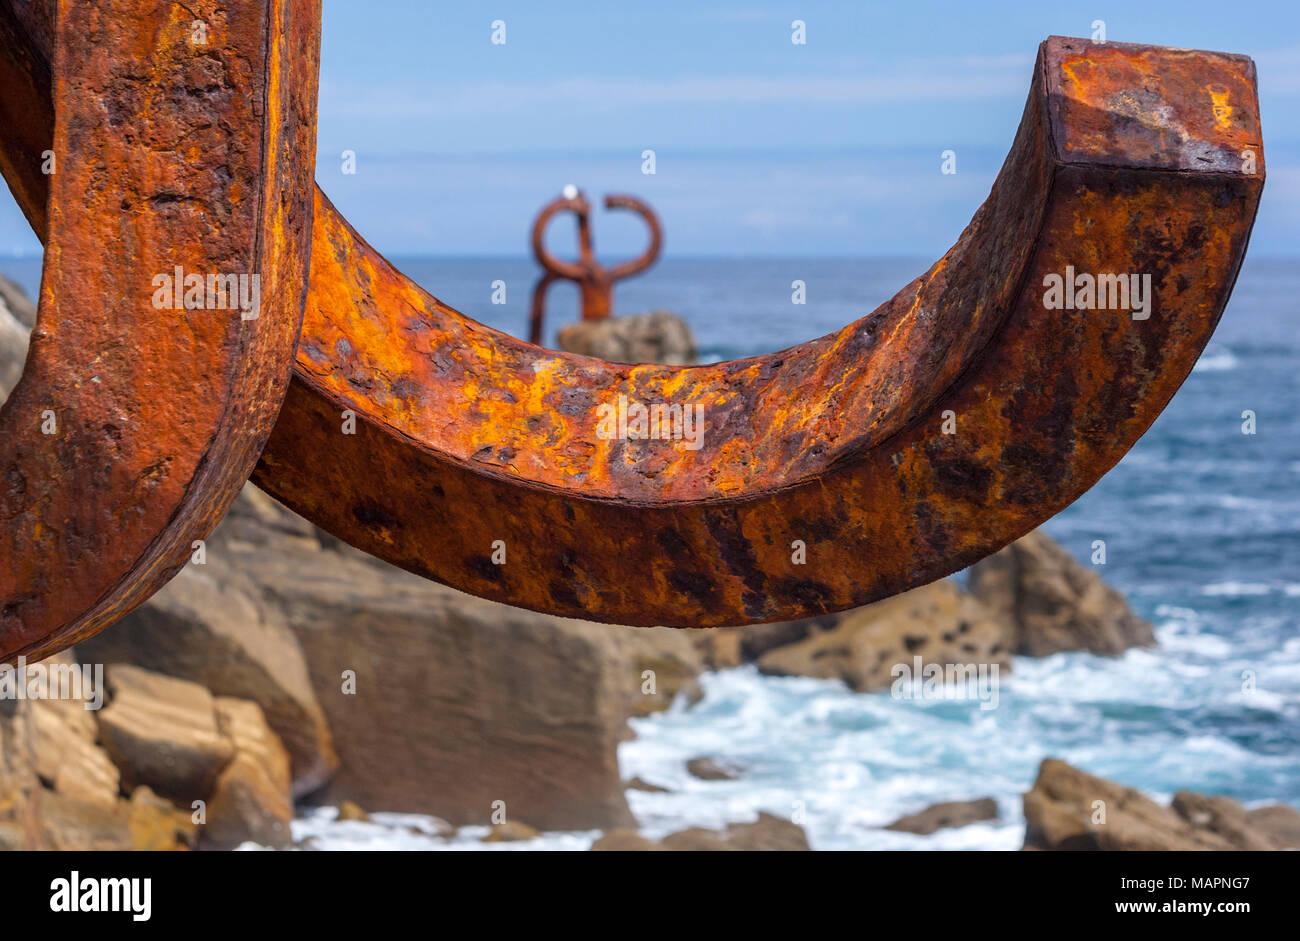 Rusted iron stockfotos rusted iron bilder alamy for Gartendeko rostigem eisen